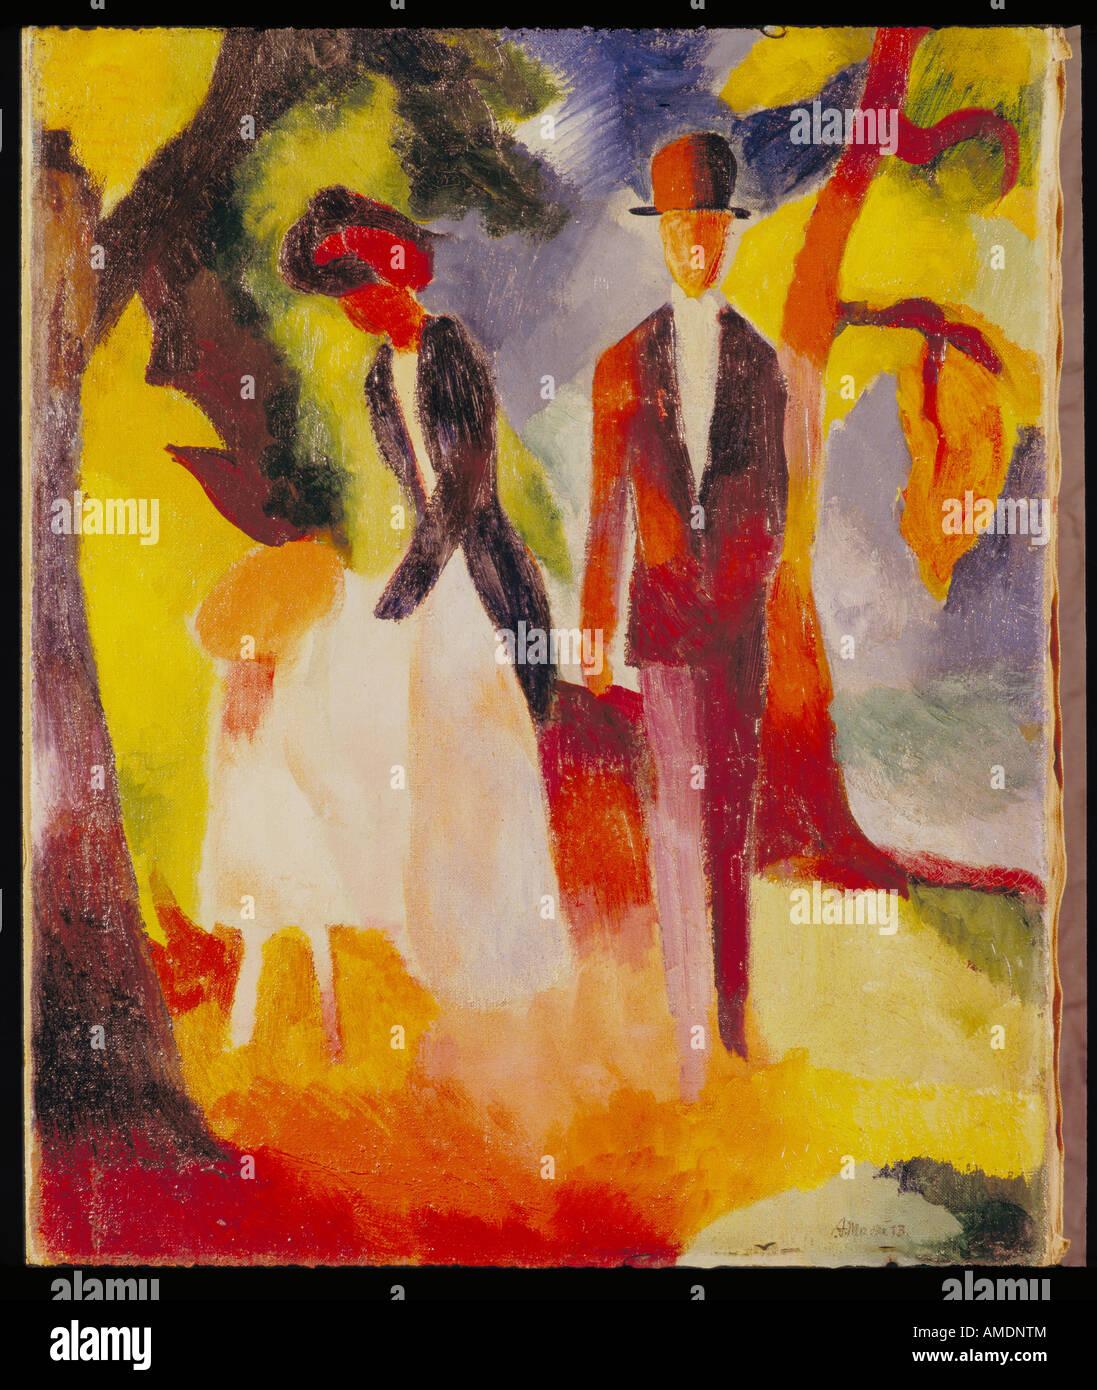 "Belle arti, Macke, Agosto (3.1.1887 - 26.9.1914), pittura, 'Leute am blauen vedere', 'persone al lago blu"", 1913, Foto Stock"